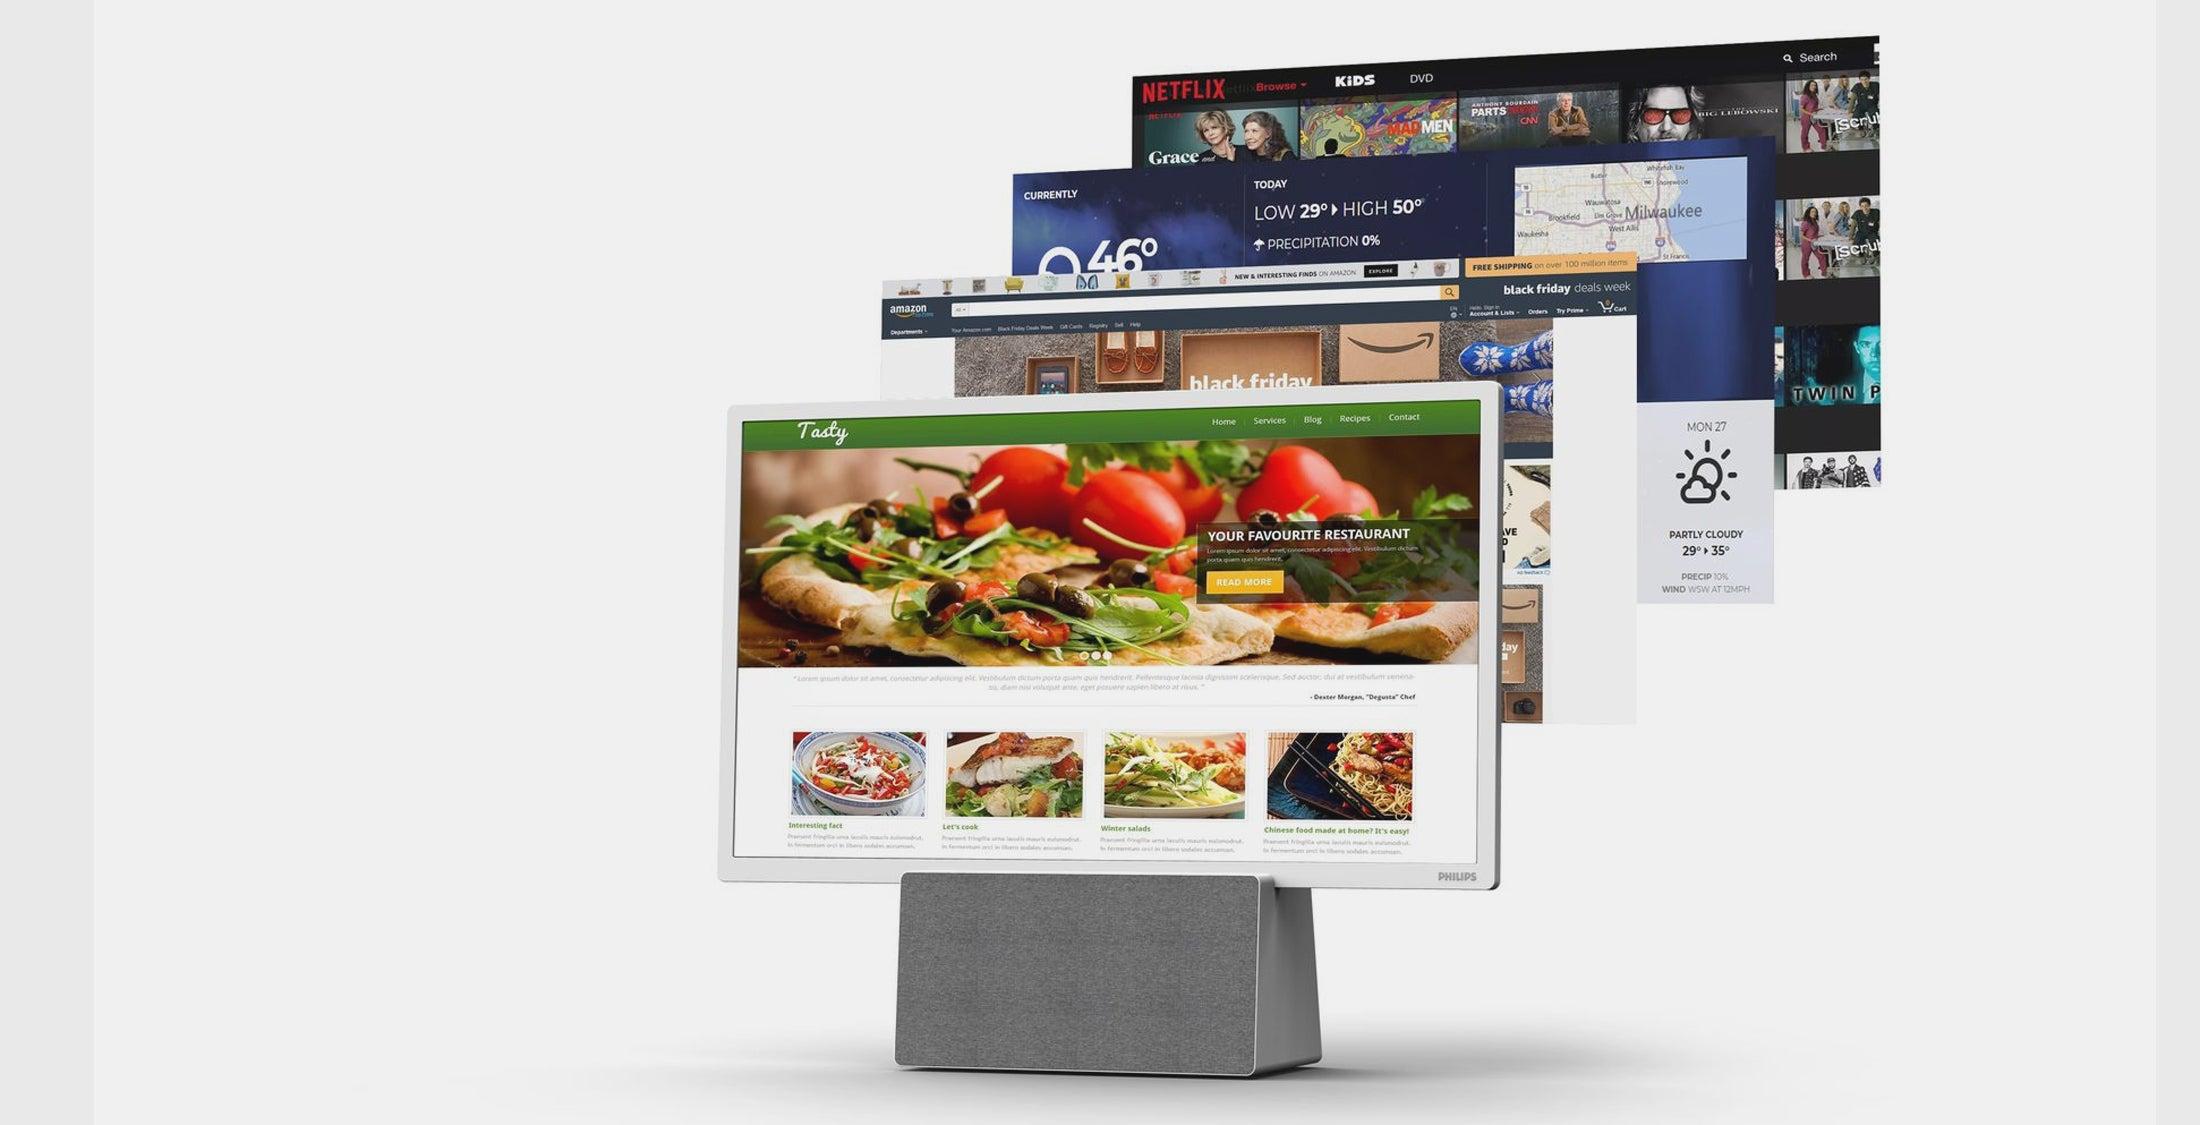 Philips Tv Ad Kitchen Appliances